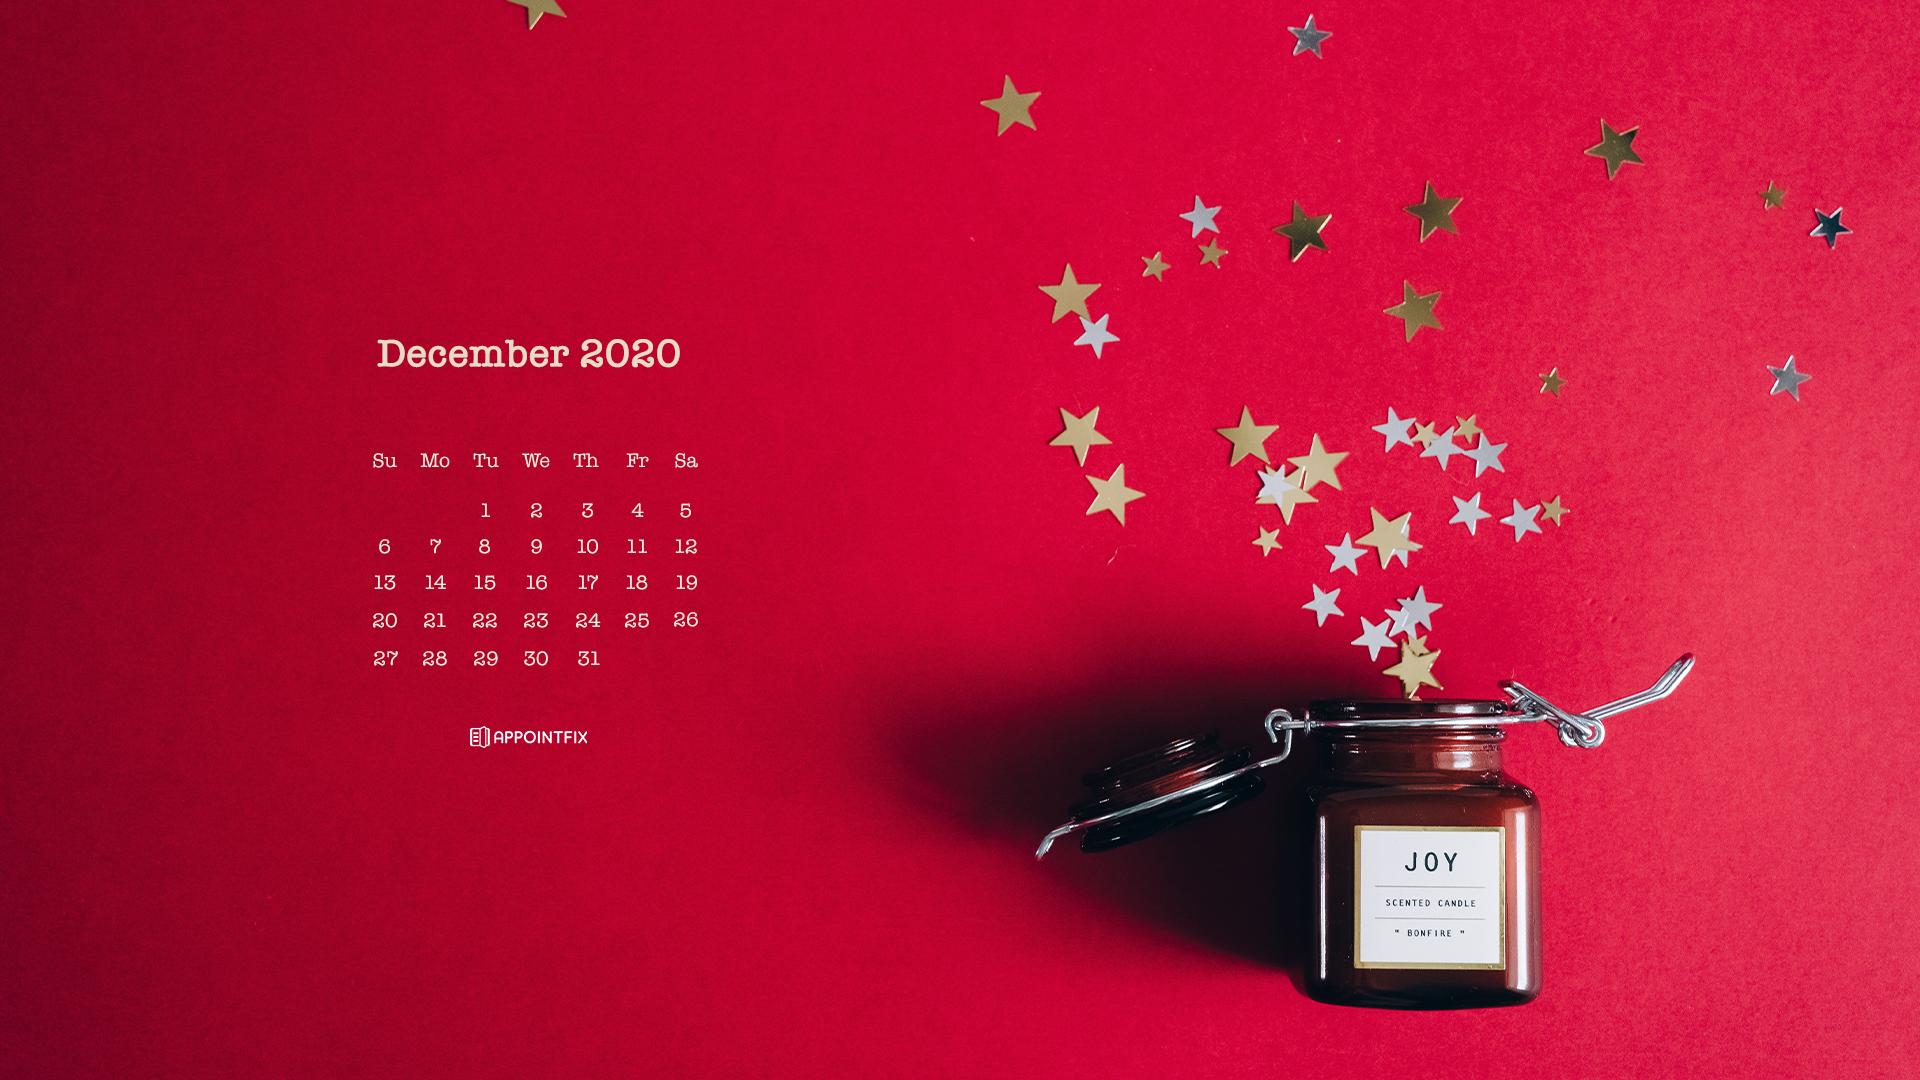 December 2020 Calendar Wallpapers   Desktop Mobile 1920x1080